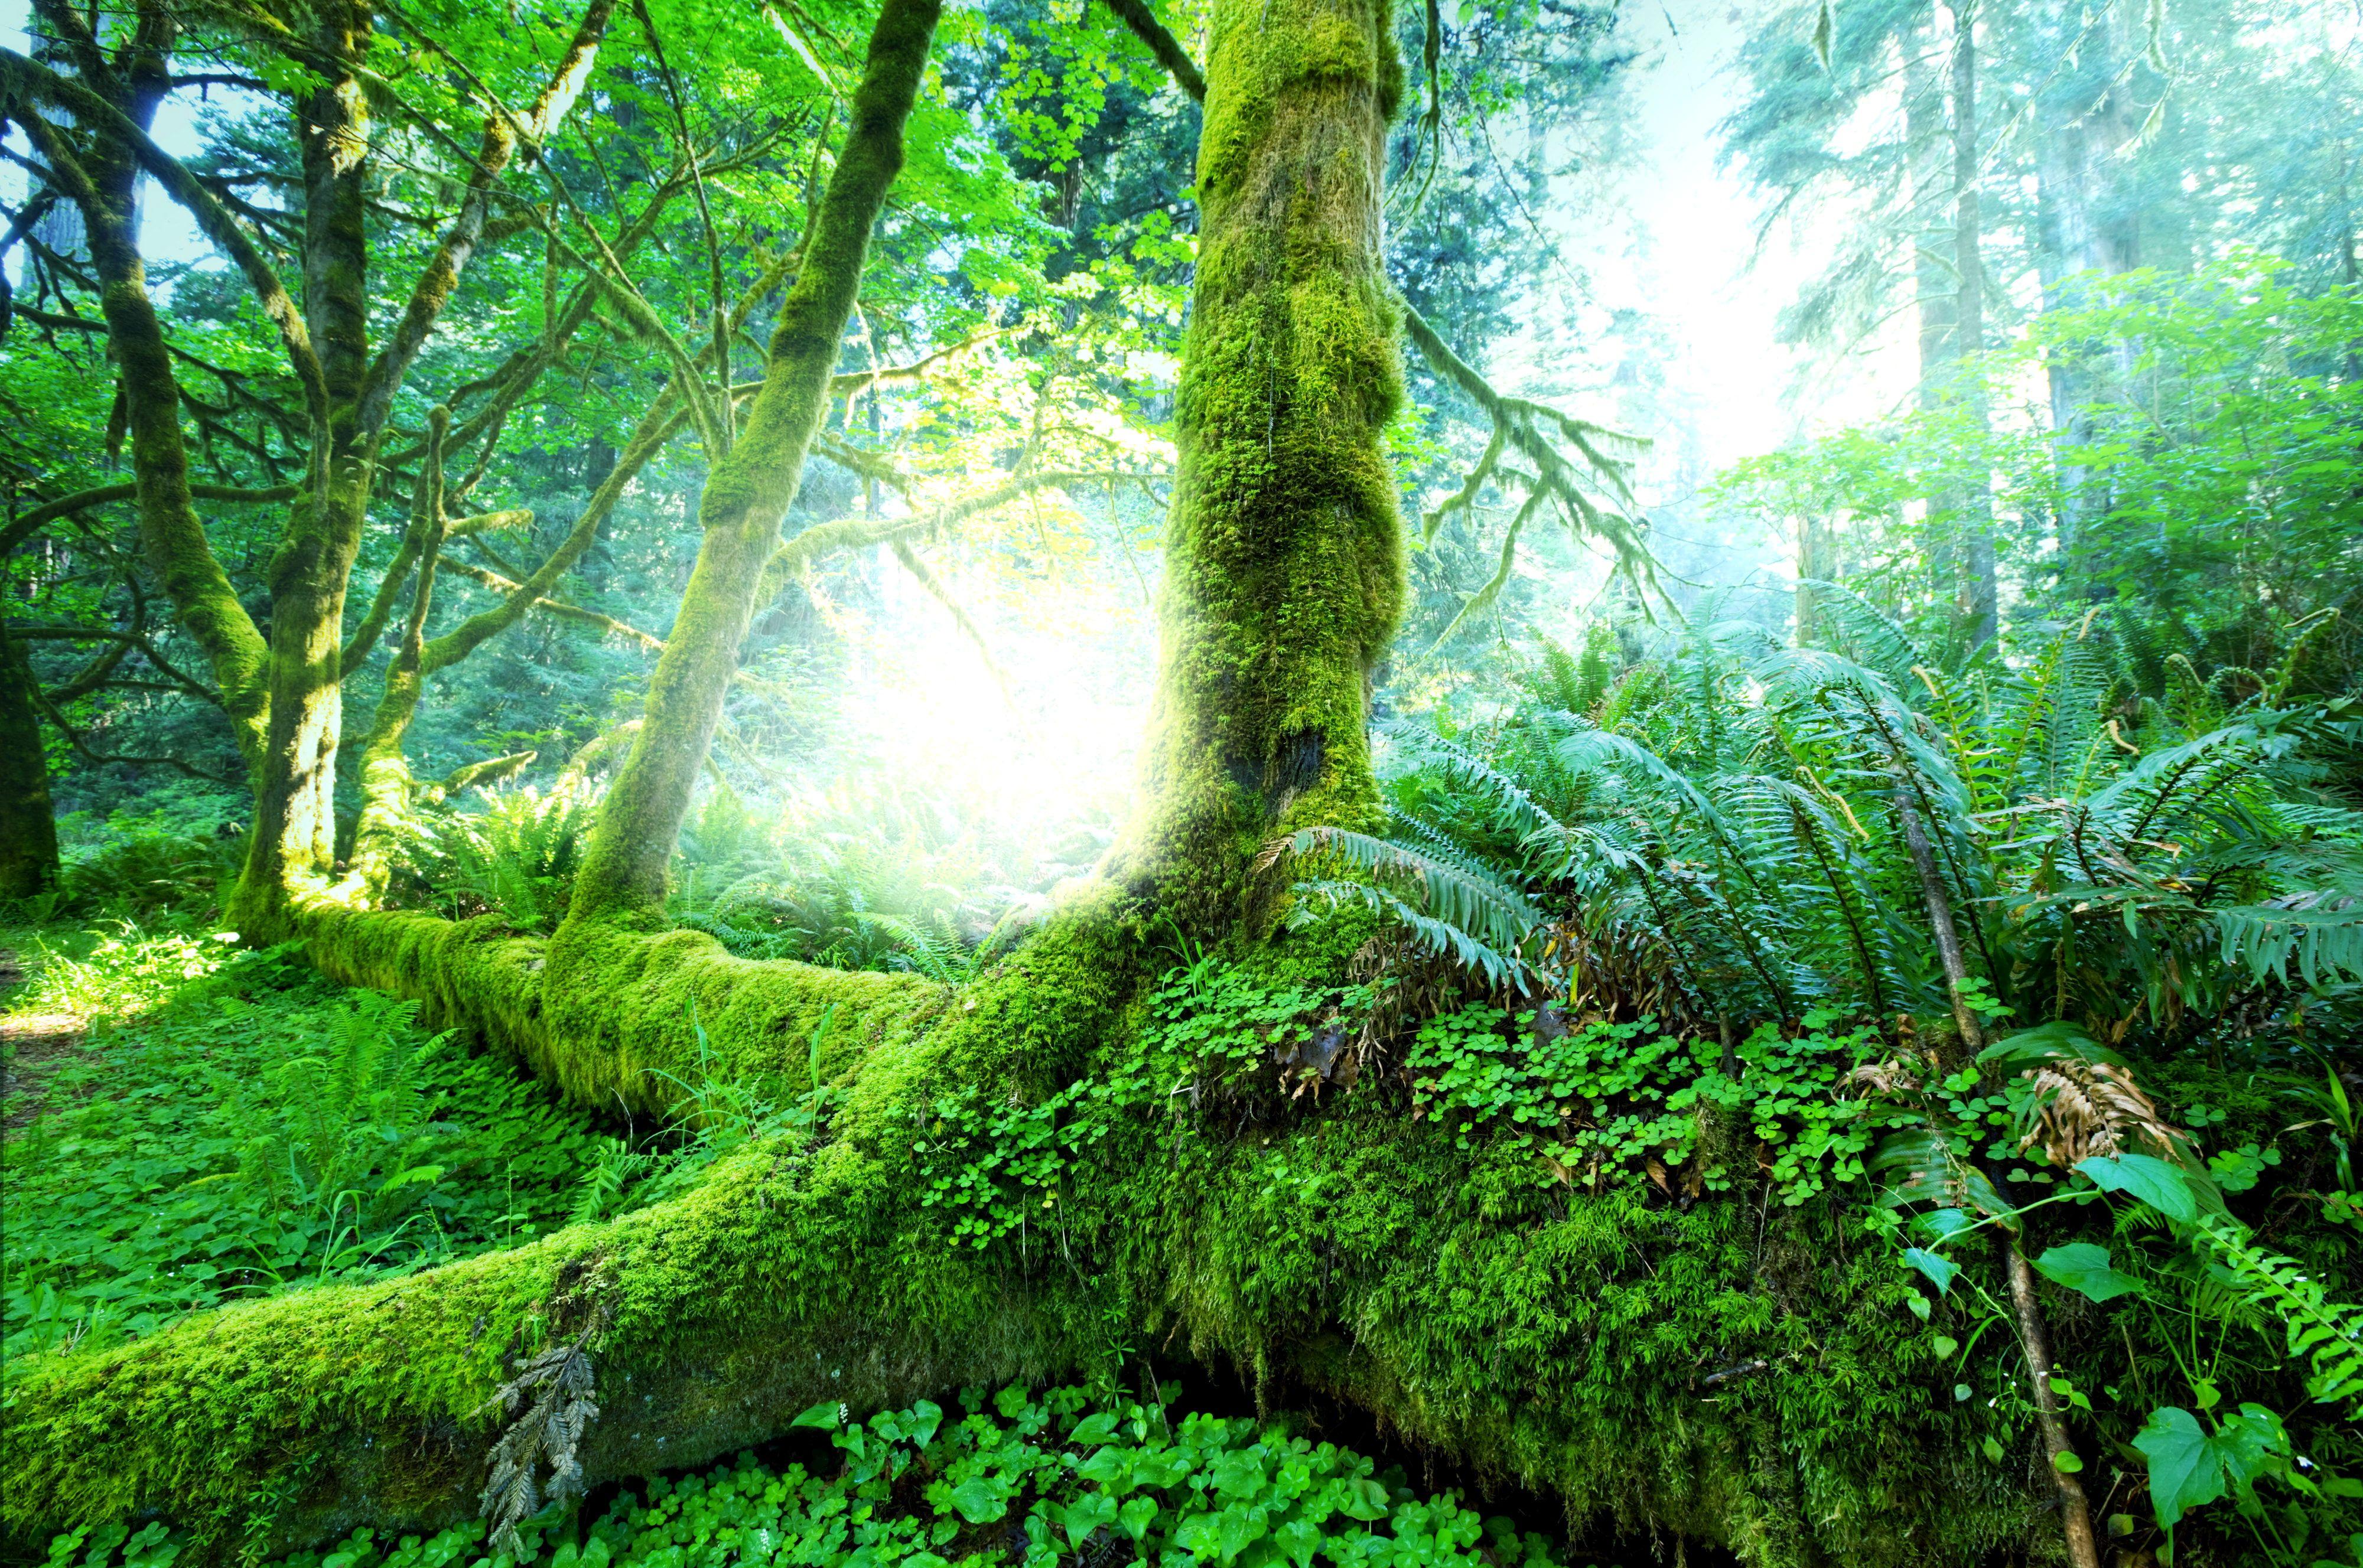 Earth Jungle Fern Moss Nature 4k Wallpaper Hdwallpaper Desktop Jungle Wallpaper Wallpaper Earth Jungle Images